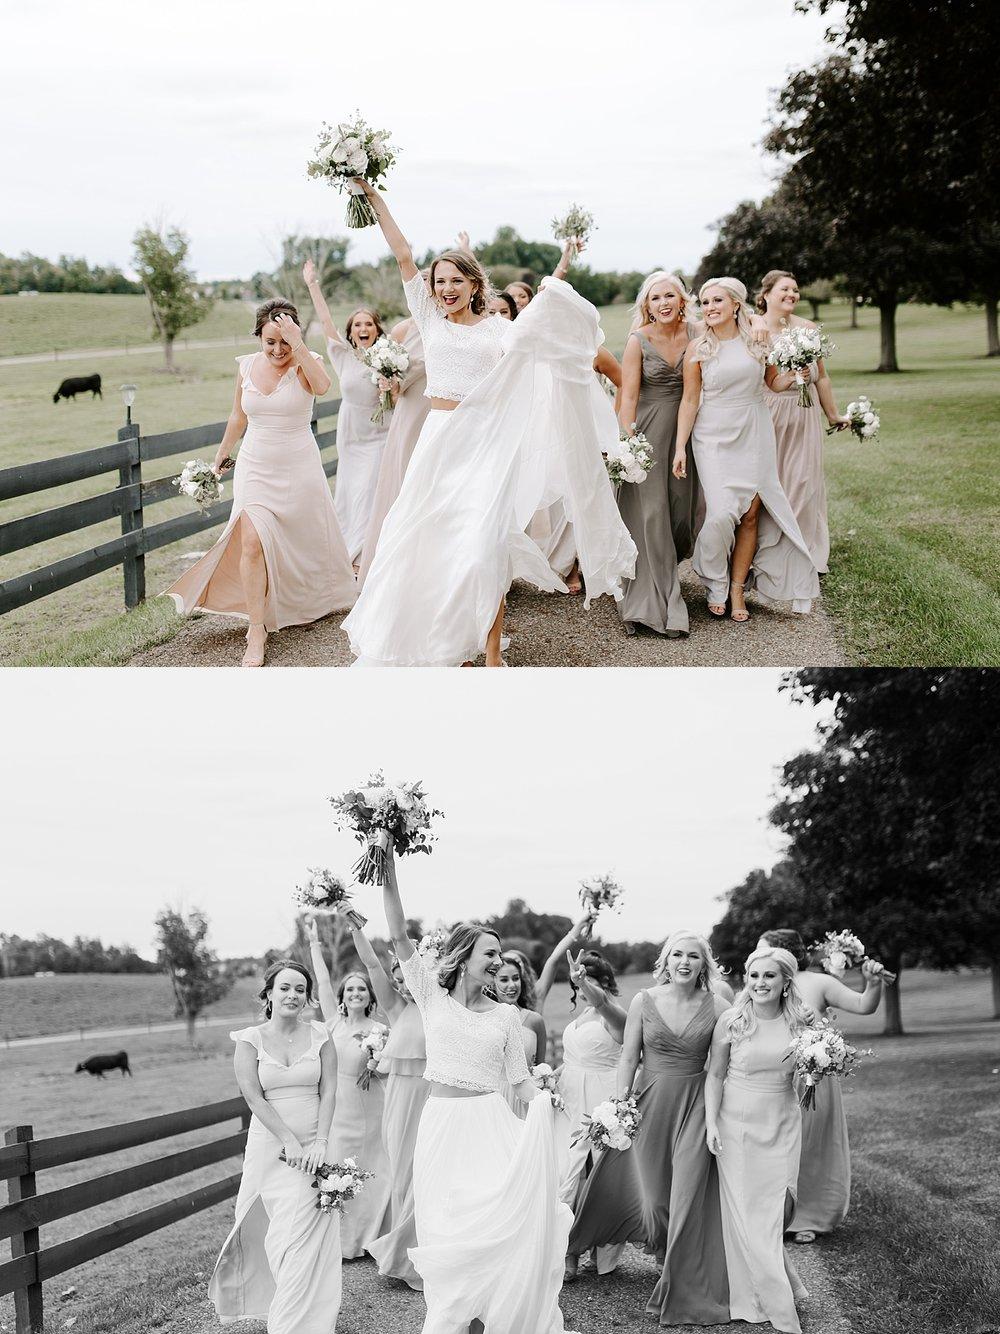 ashley-sara-photography-pittsburgh-photographer-wedding-photographer-brookside-farm-wedding-louisville-ohio.jpg3.jpg